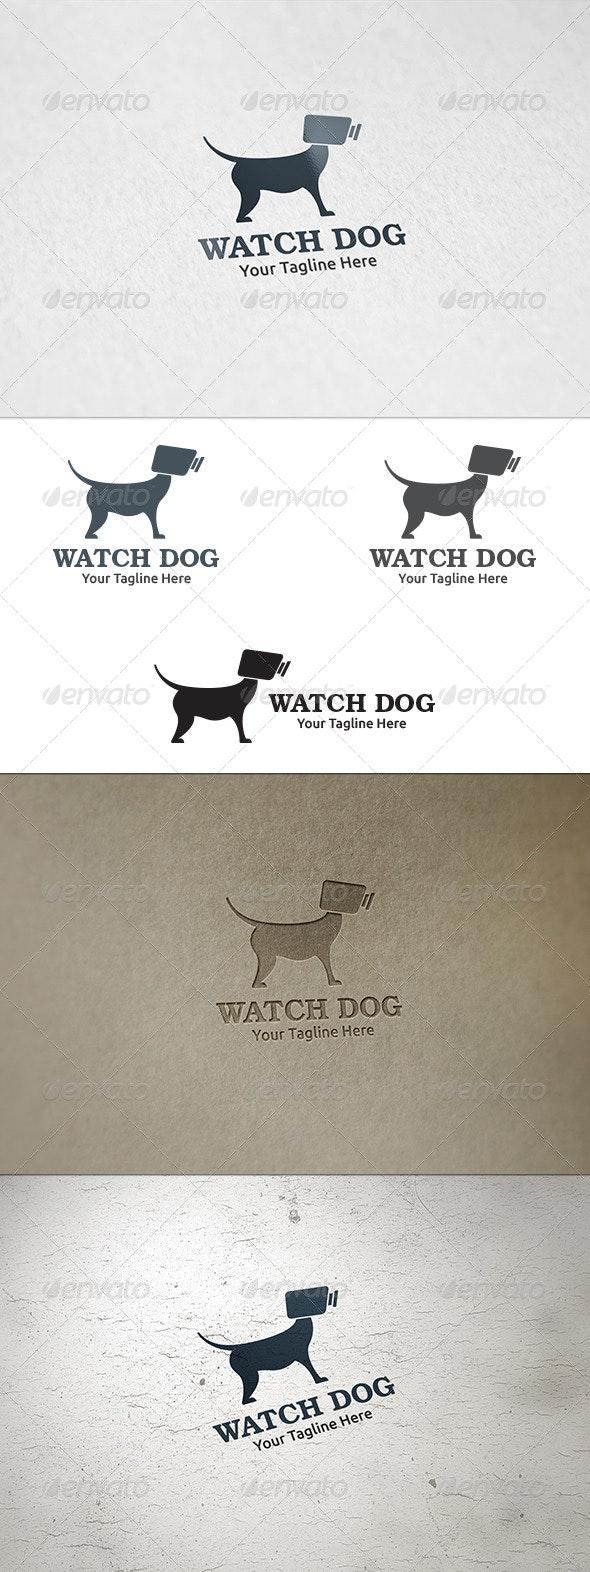 Watch Dog - Logo Template - Animals Logo Templates